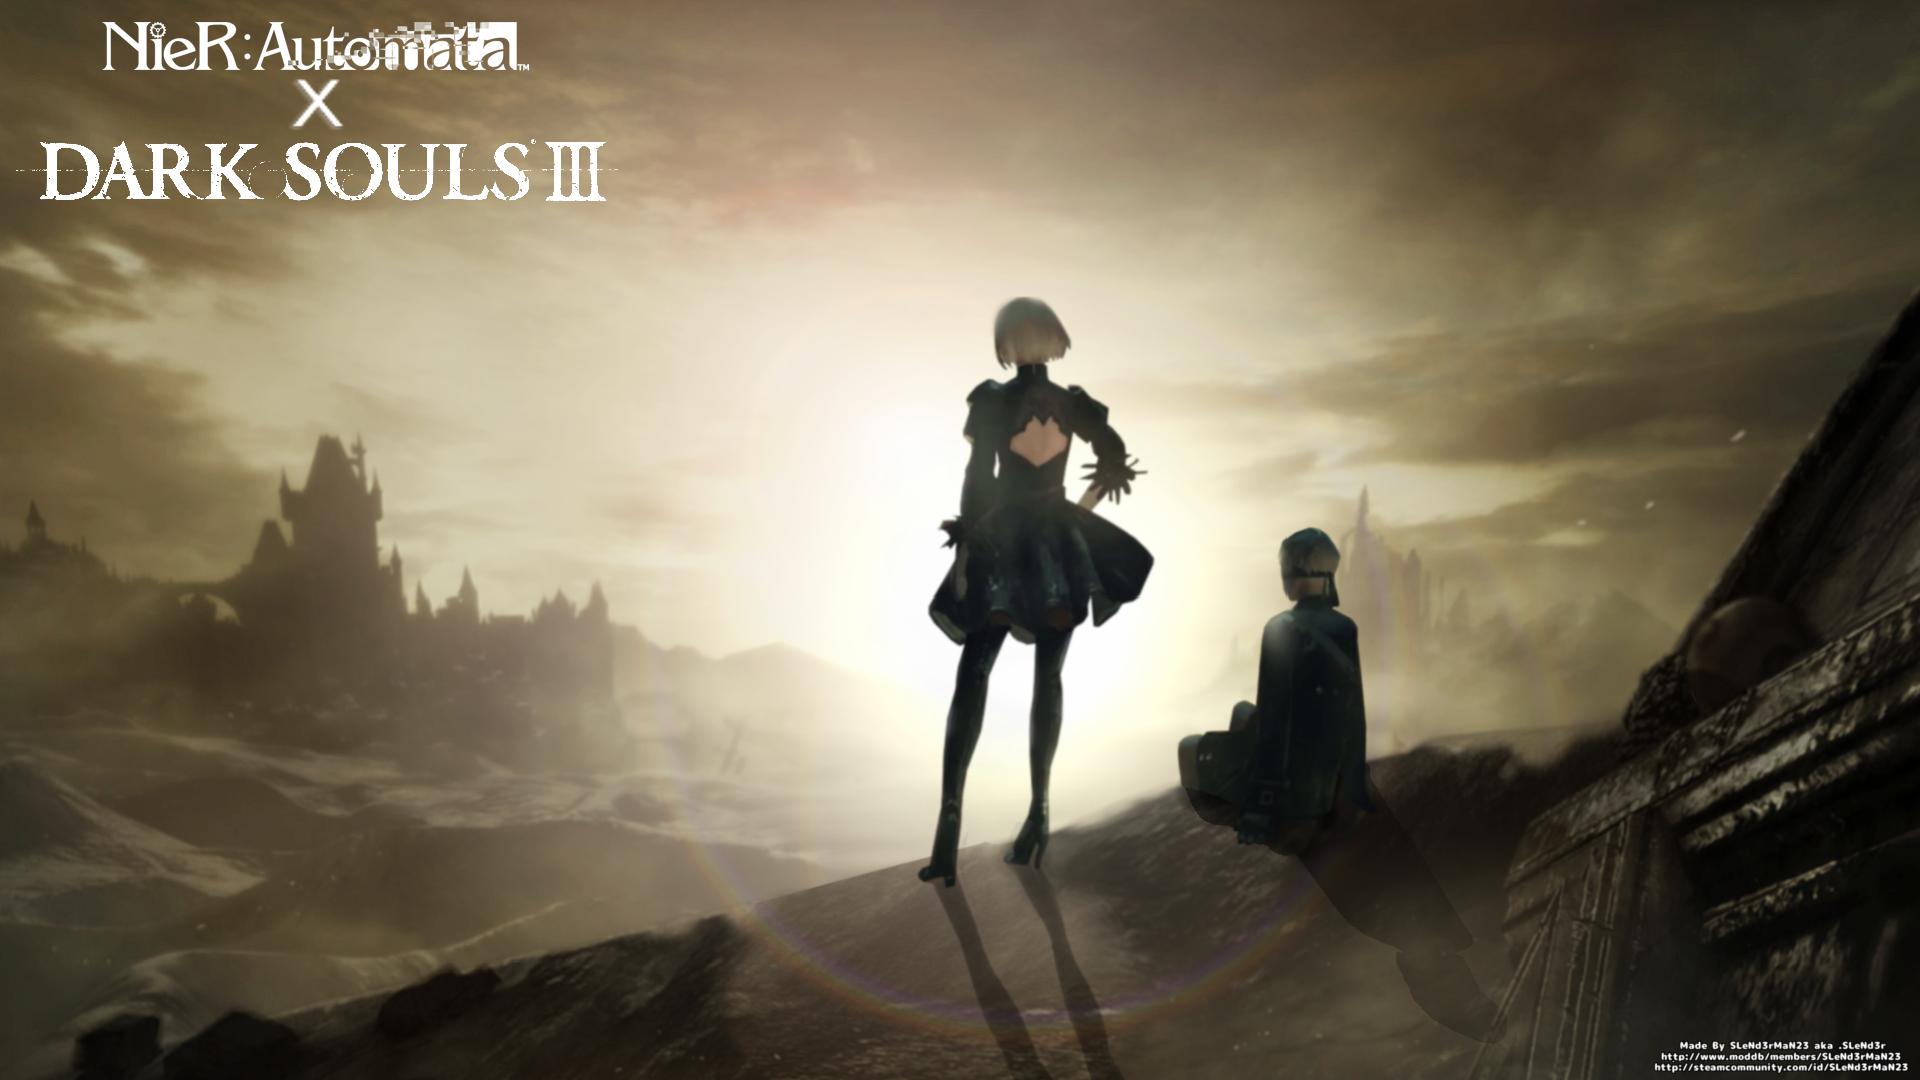 Nier Automata X Dark Souls Iii Music Replacement Mod Mod Db